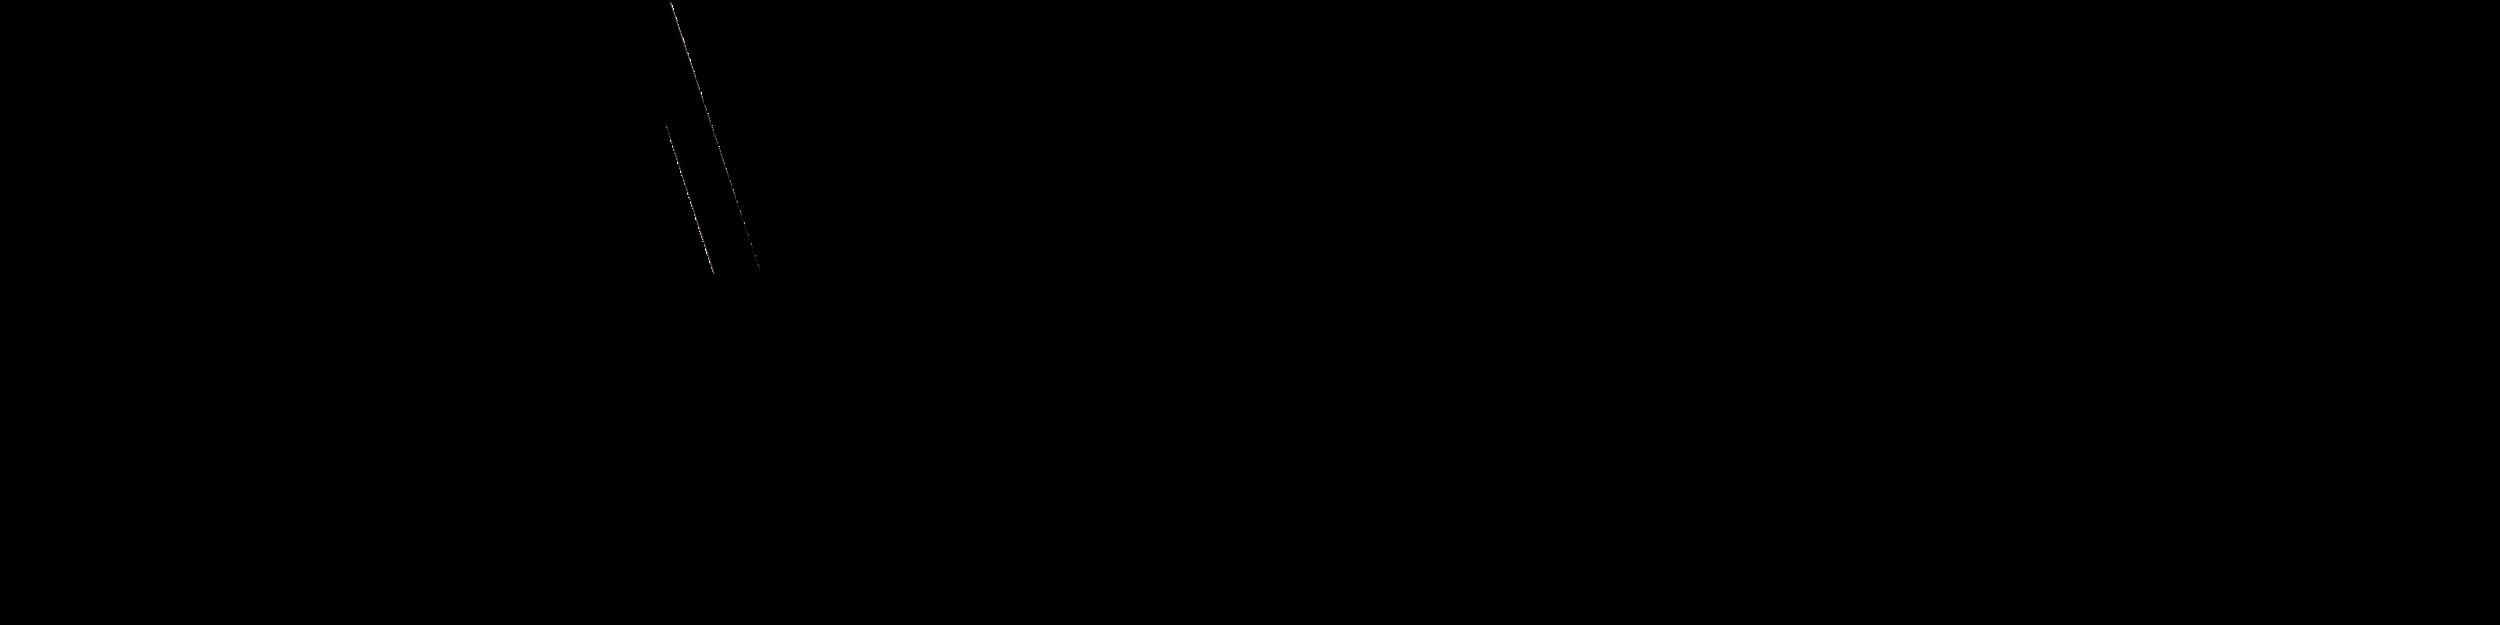 Broadway Crew Gear Logo 1.png